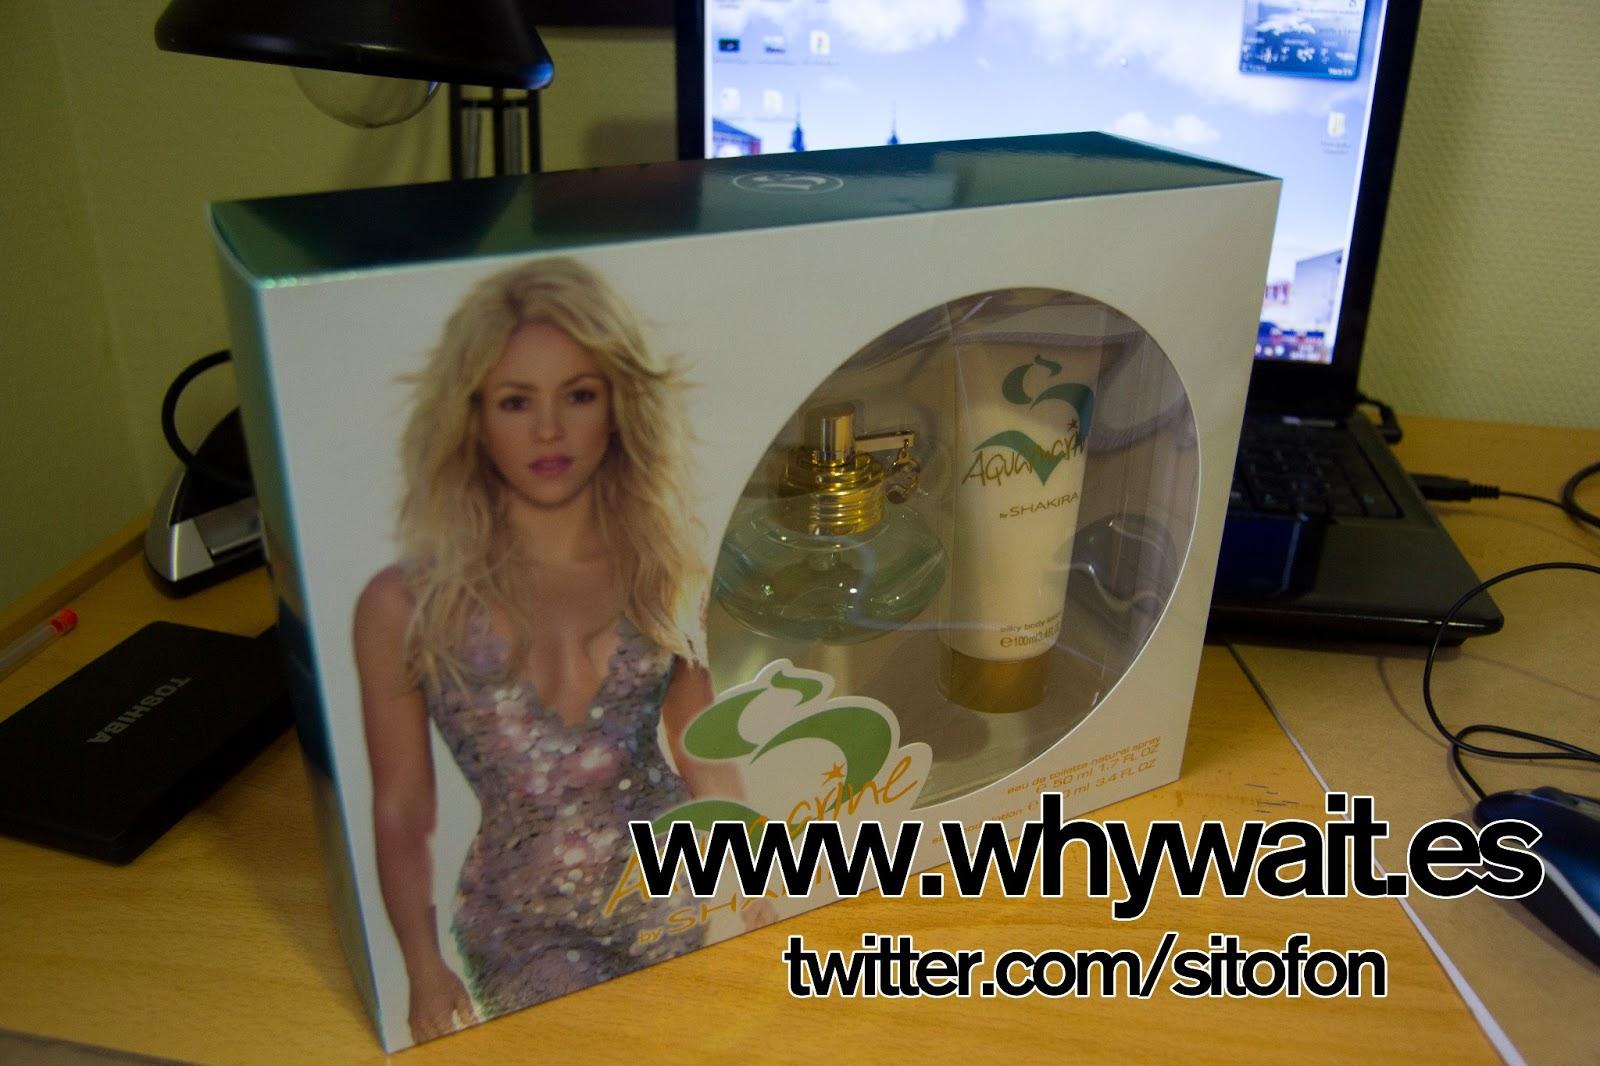 http://2.bp.blogspot.com/-D2ca7SQget8/UPmG9dK-6uI/AAAAAAAAIeA/7j54HfOZmF8/s1600/Shakira-s-by-aquamarine-fragancia-colonia-2013-whywait-copyright-sudafrica+(4).jpg